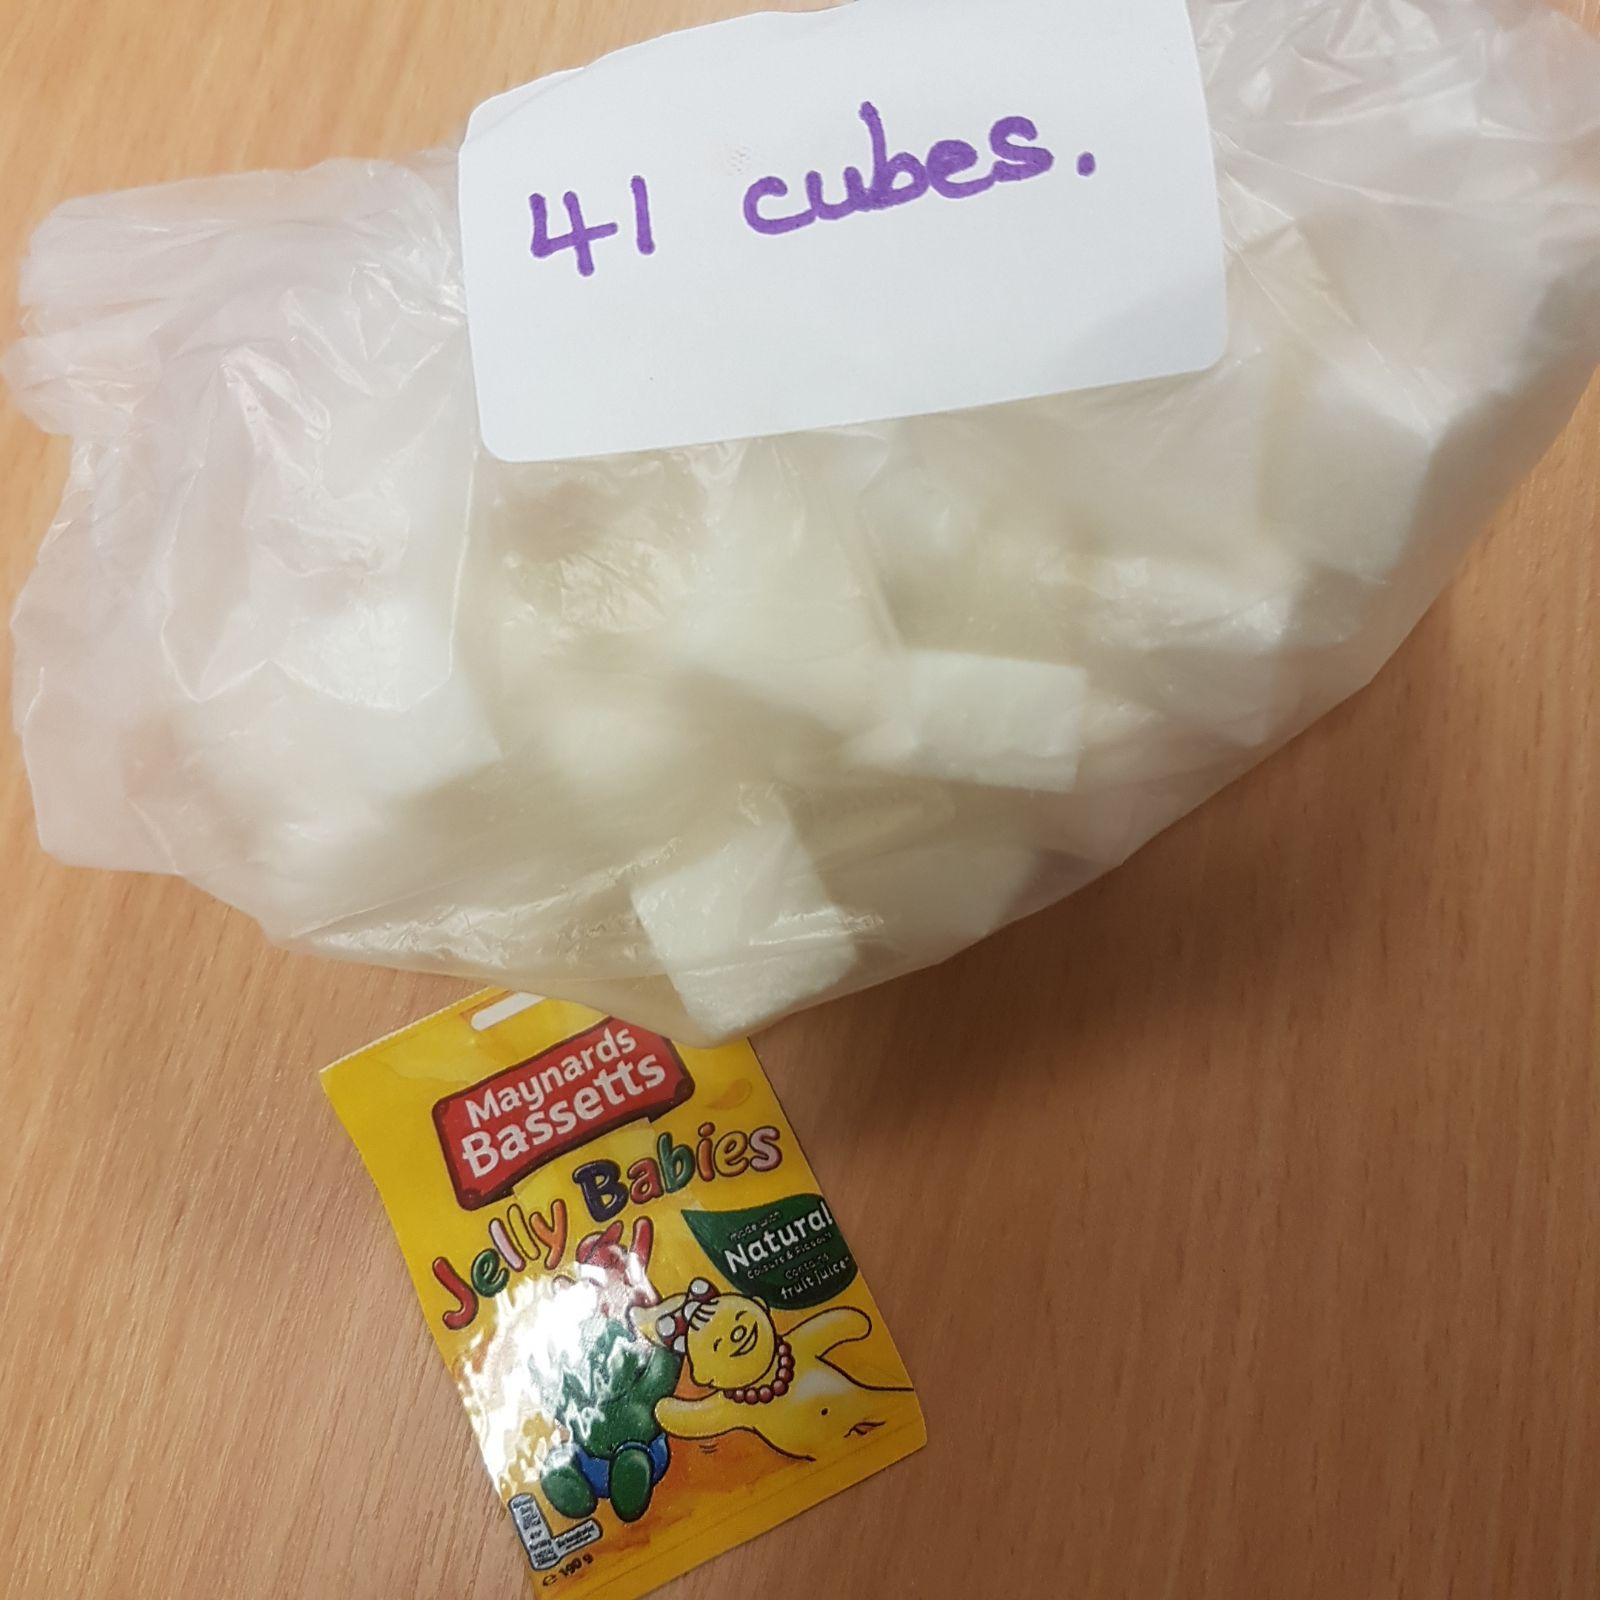 sugar cubes jelly babies.jpg